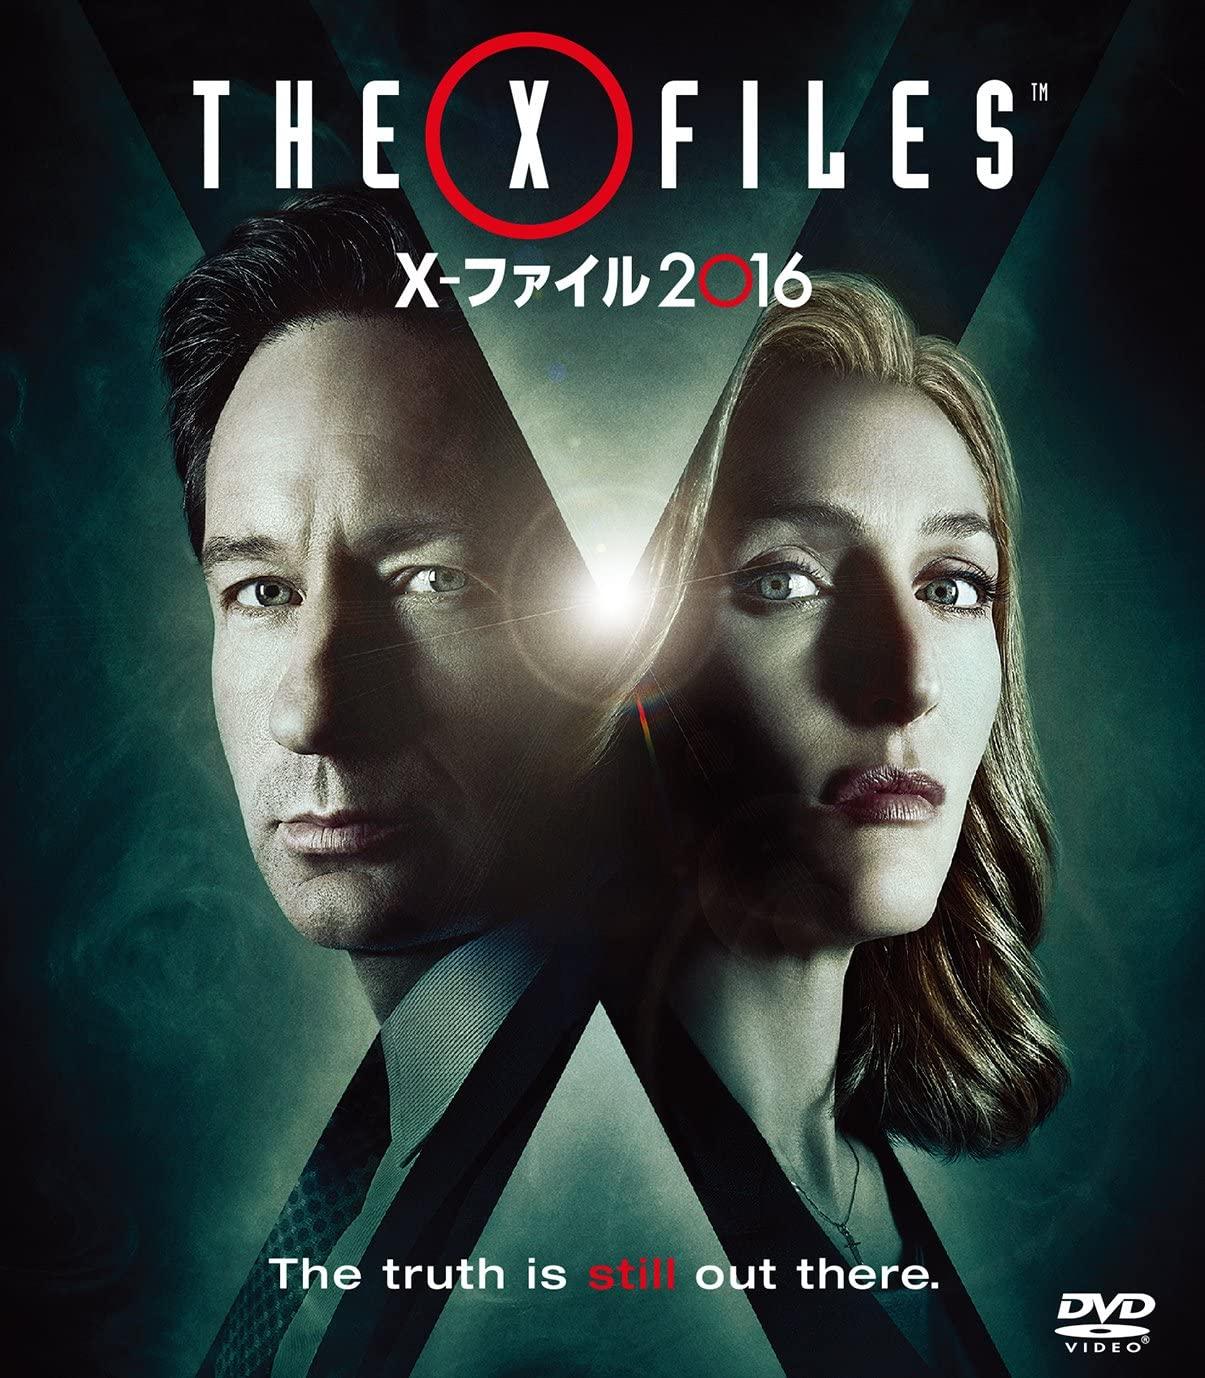 X-ファイル 2016のDVD